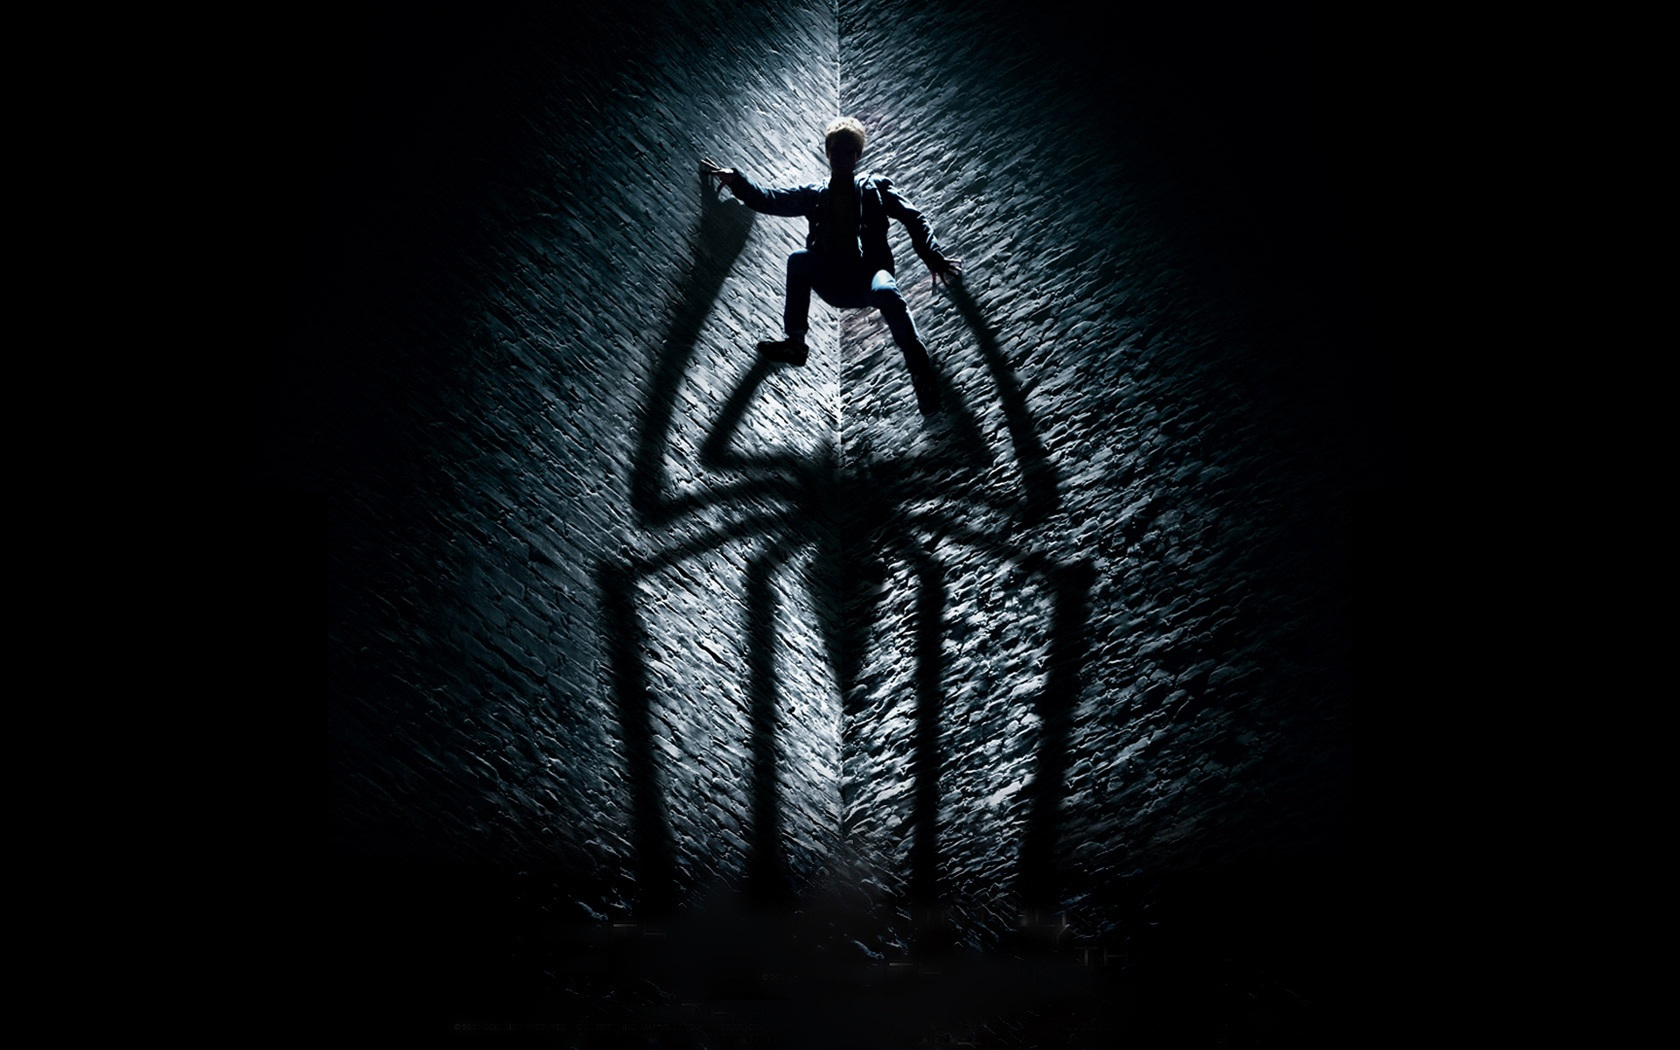 The Amazing Spider Man, Andrew Garfield